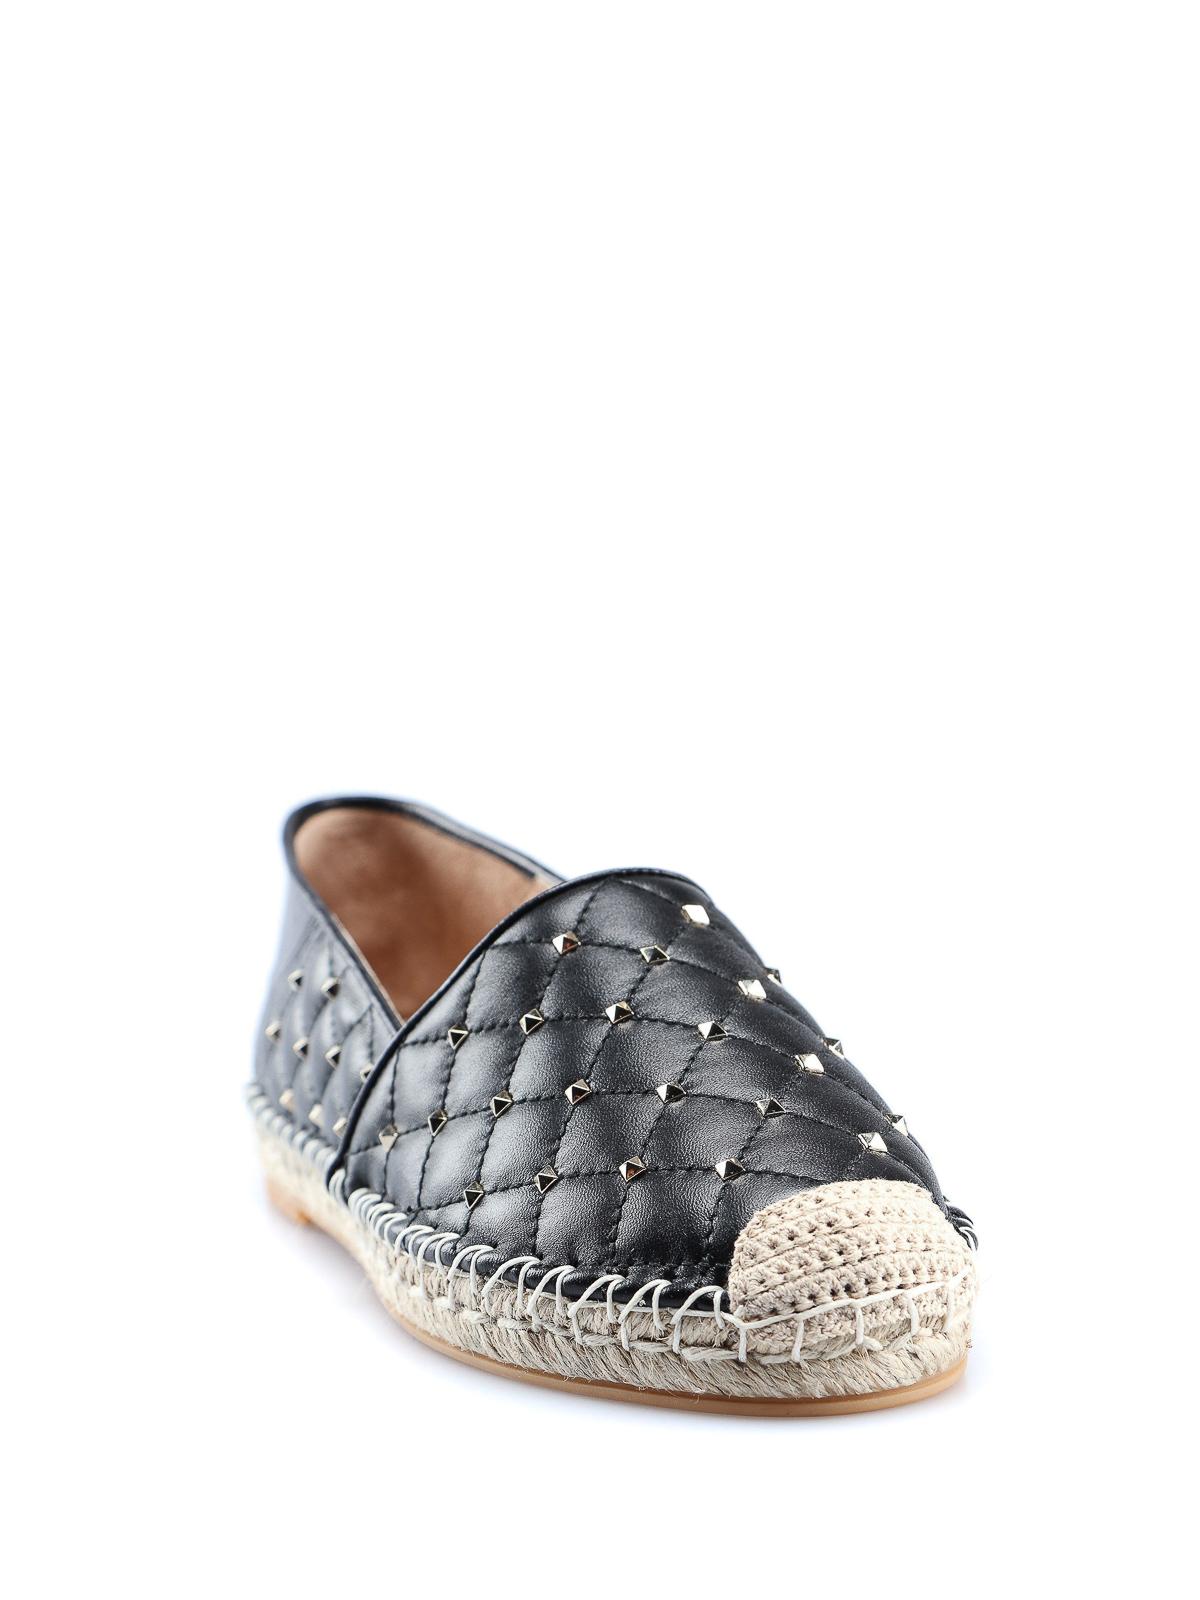 5de1c4bff0209 VALENTINO GARAVANI: espadrilles online - Rockstud black quilted leather  espadrilles